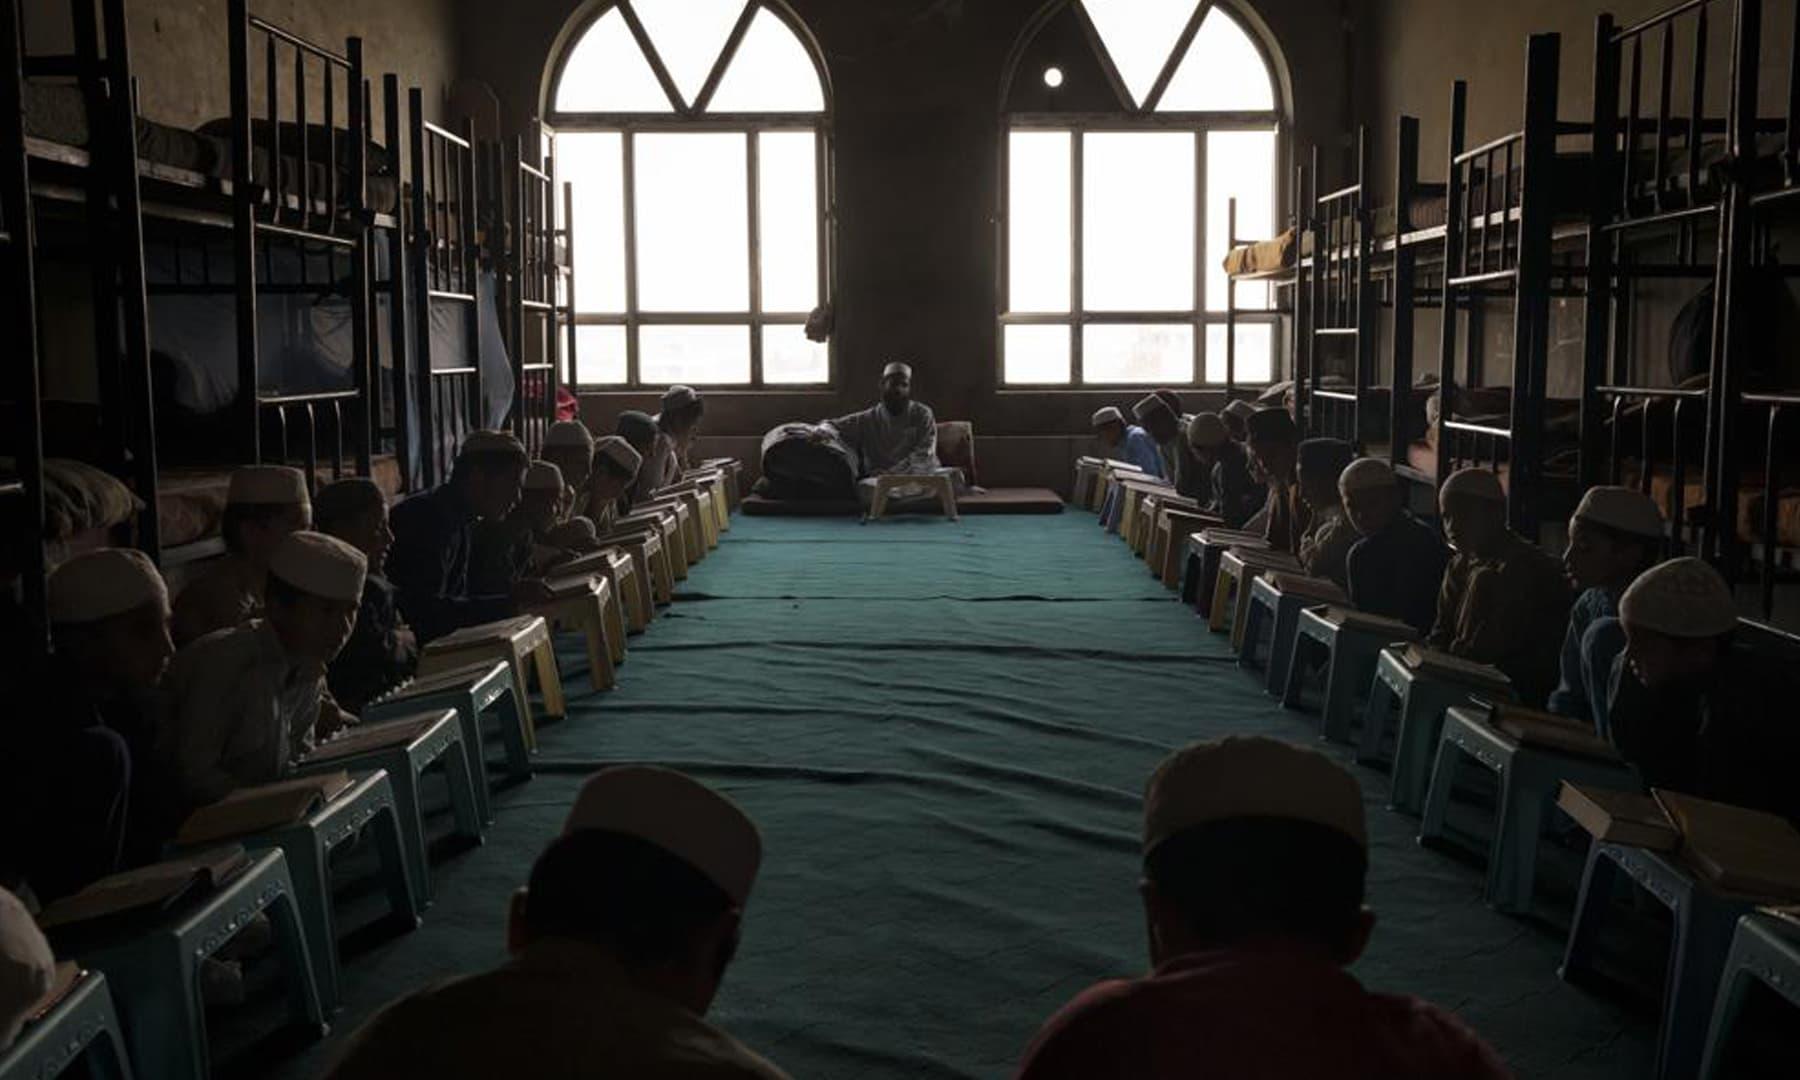 Afghan boys read the Holy Quran at the Khatamul Anbiya madressah in Kabul, Afghanistan. — AP